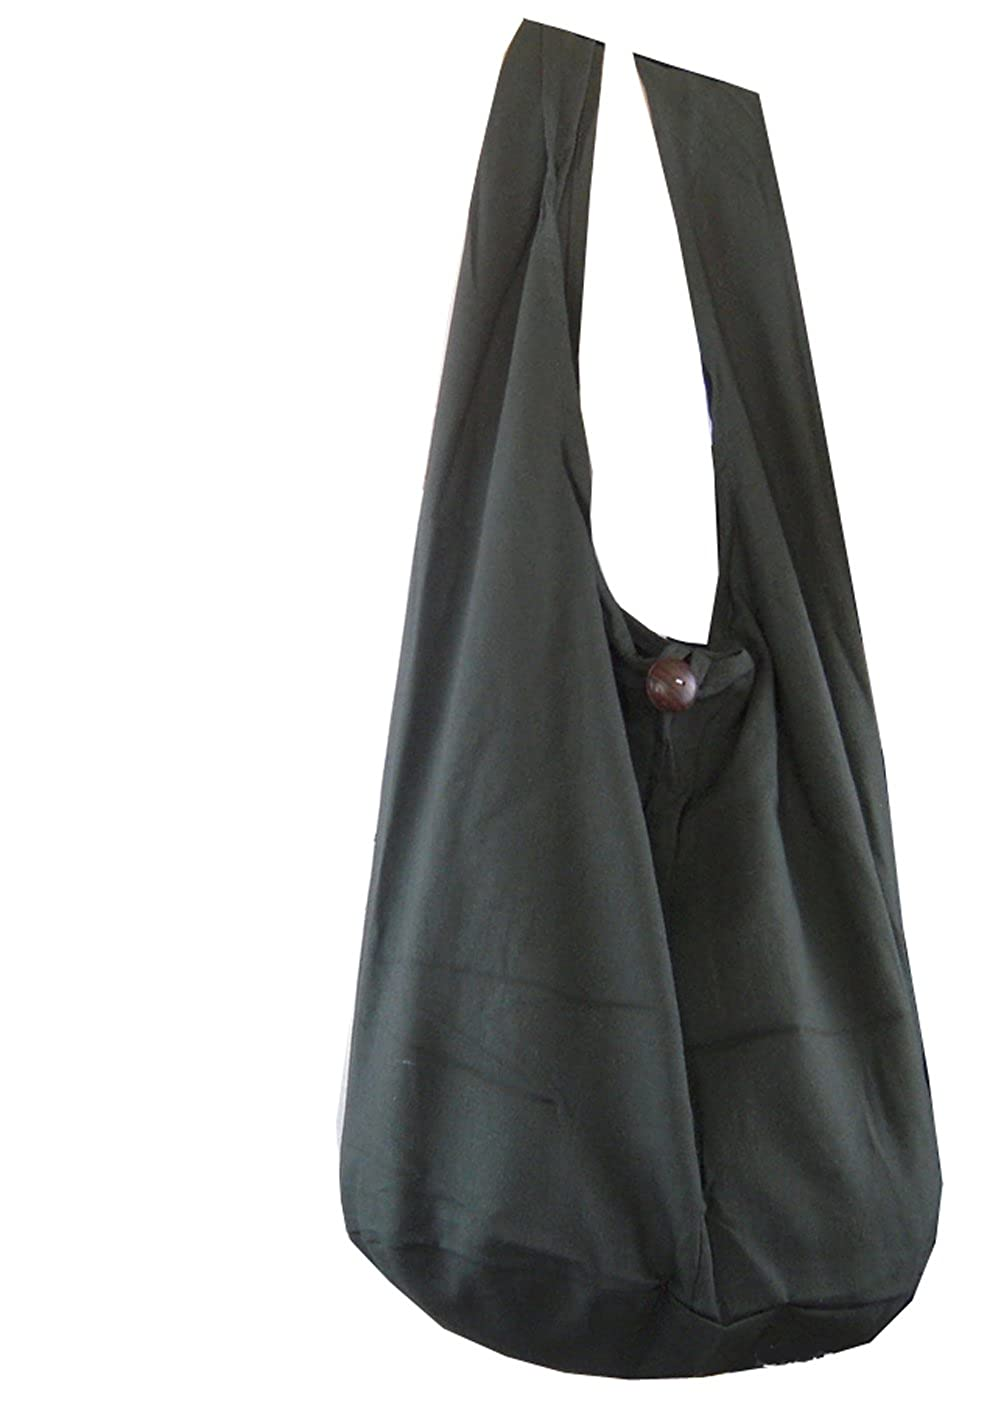 11ca69d3b7a1 Thai monk buddha cotton sling bag crossbody messenger purse hippie hobo  grey shoes jpg 1001x1401 Monk